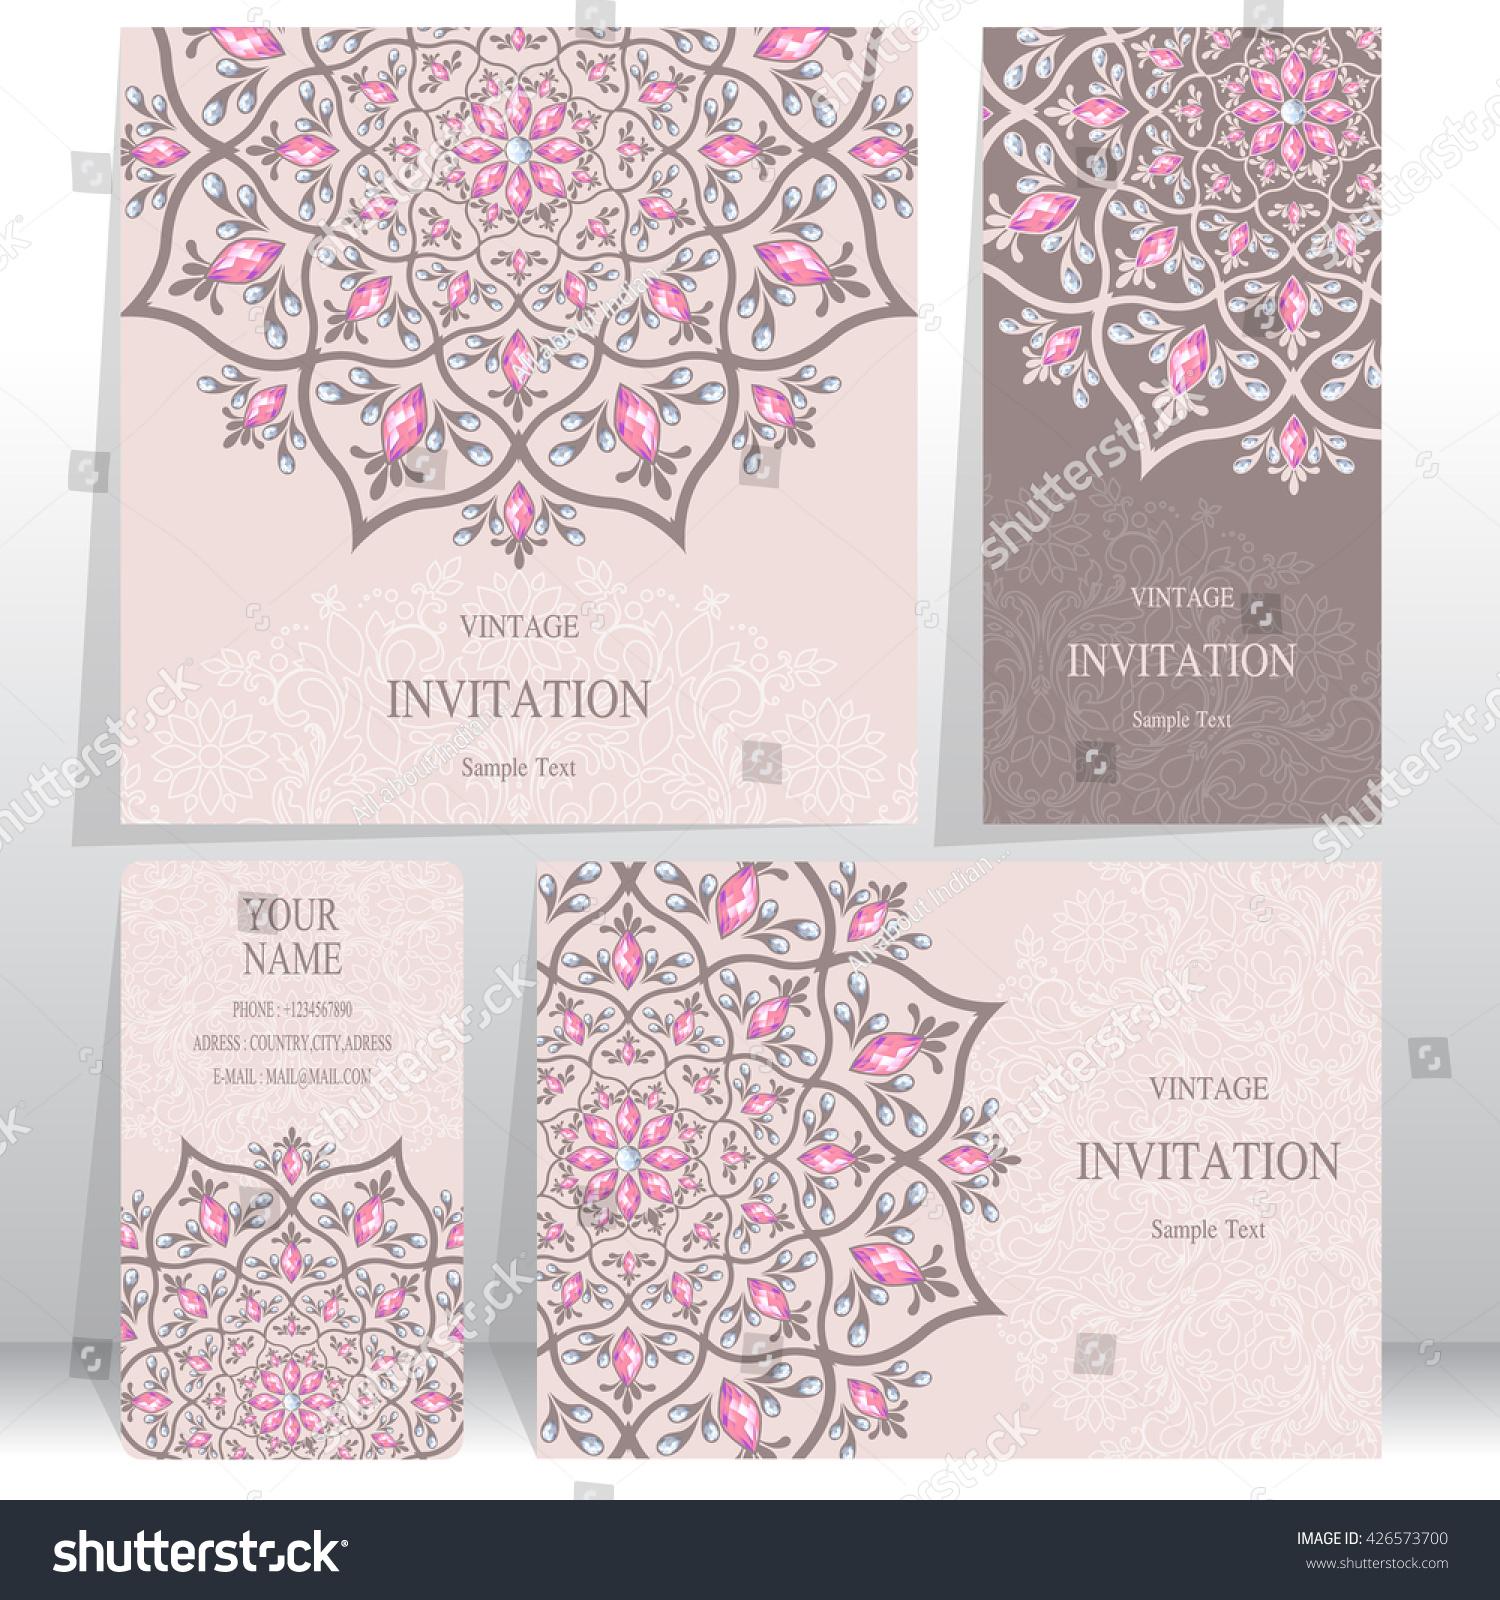 Set Wedding Invitation Cardsbusiness Cards Card Stock Vector ...